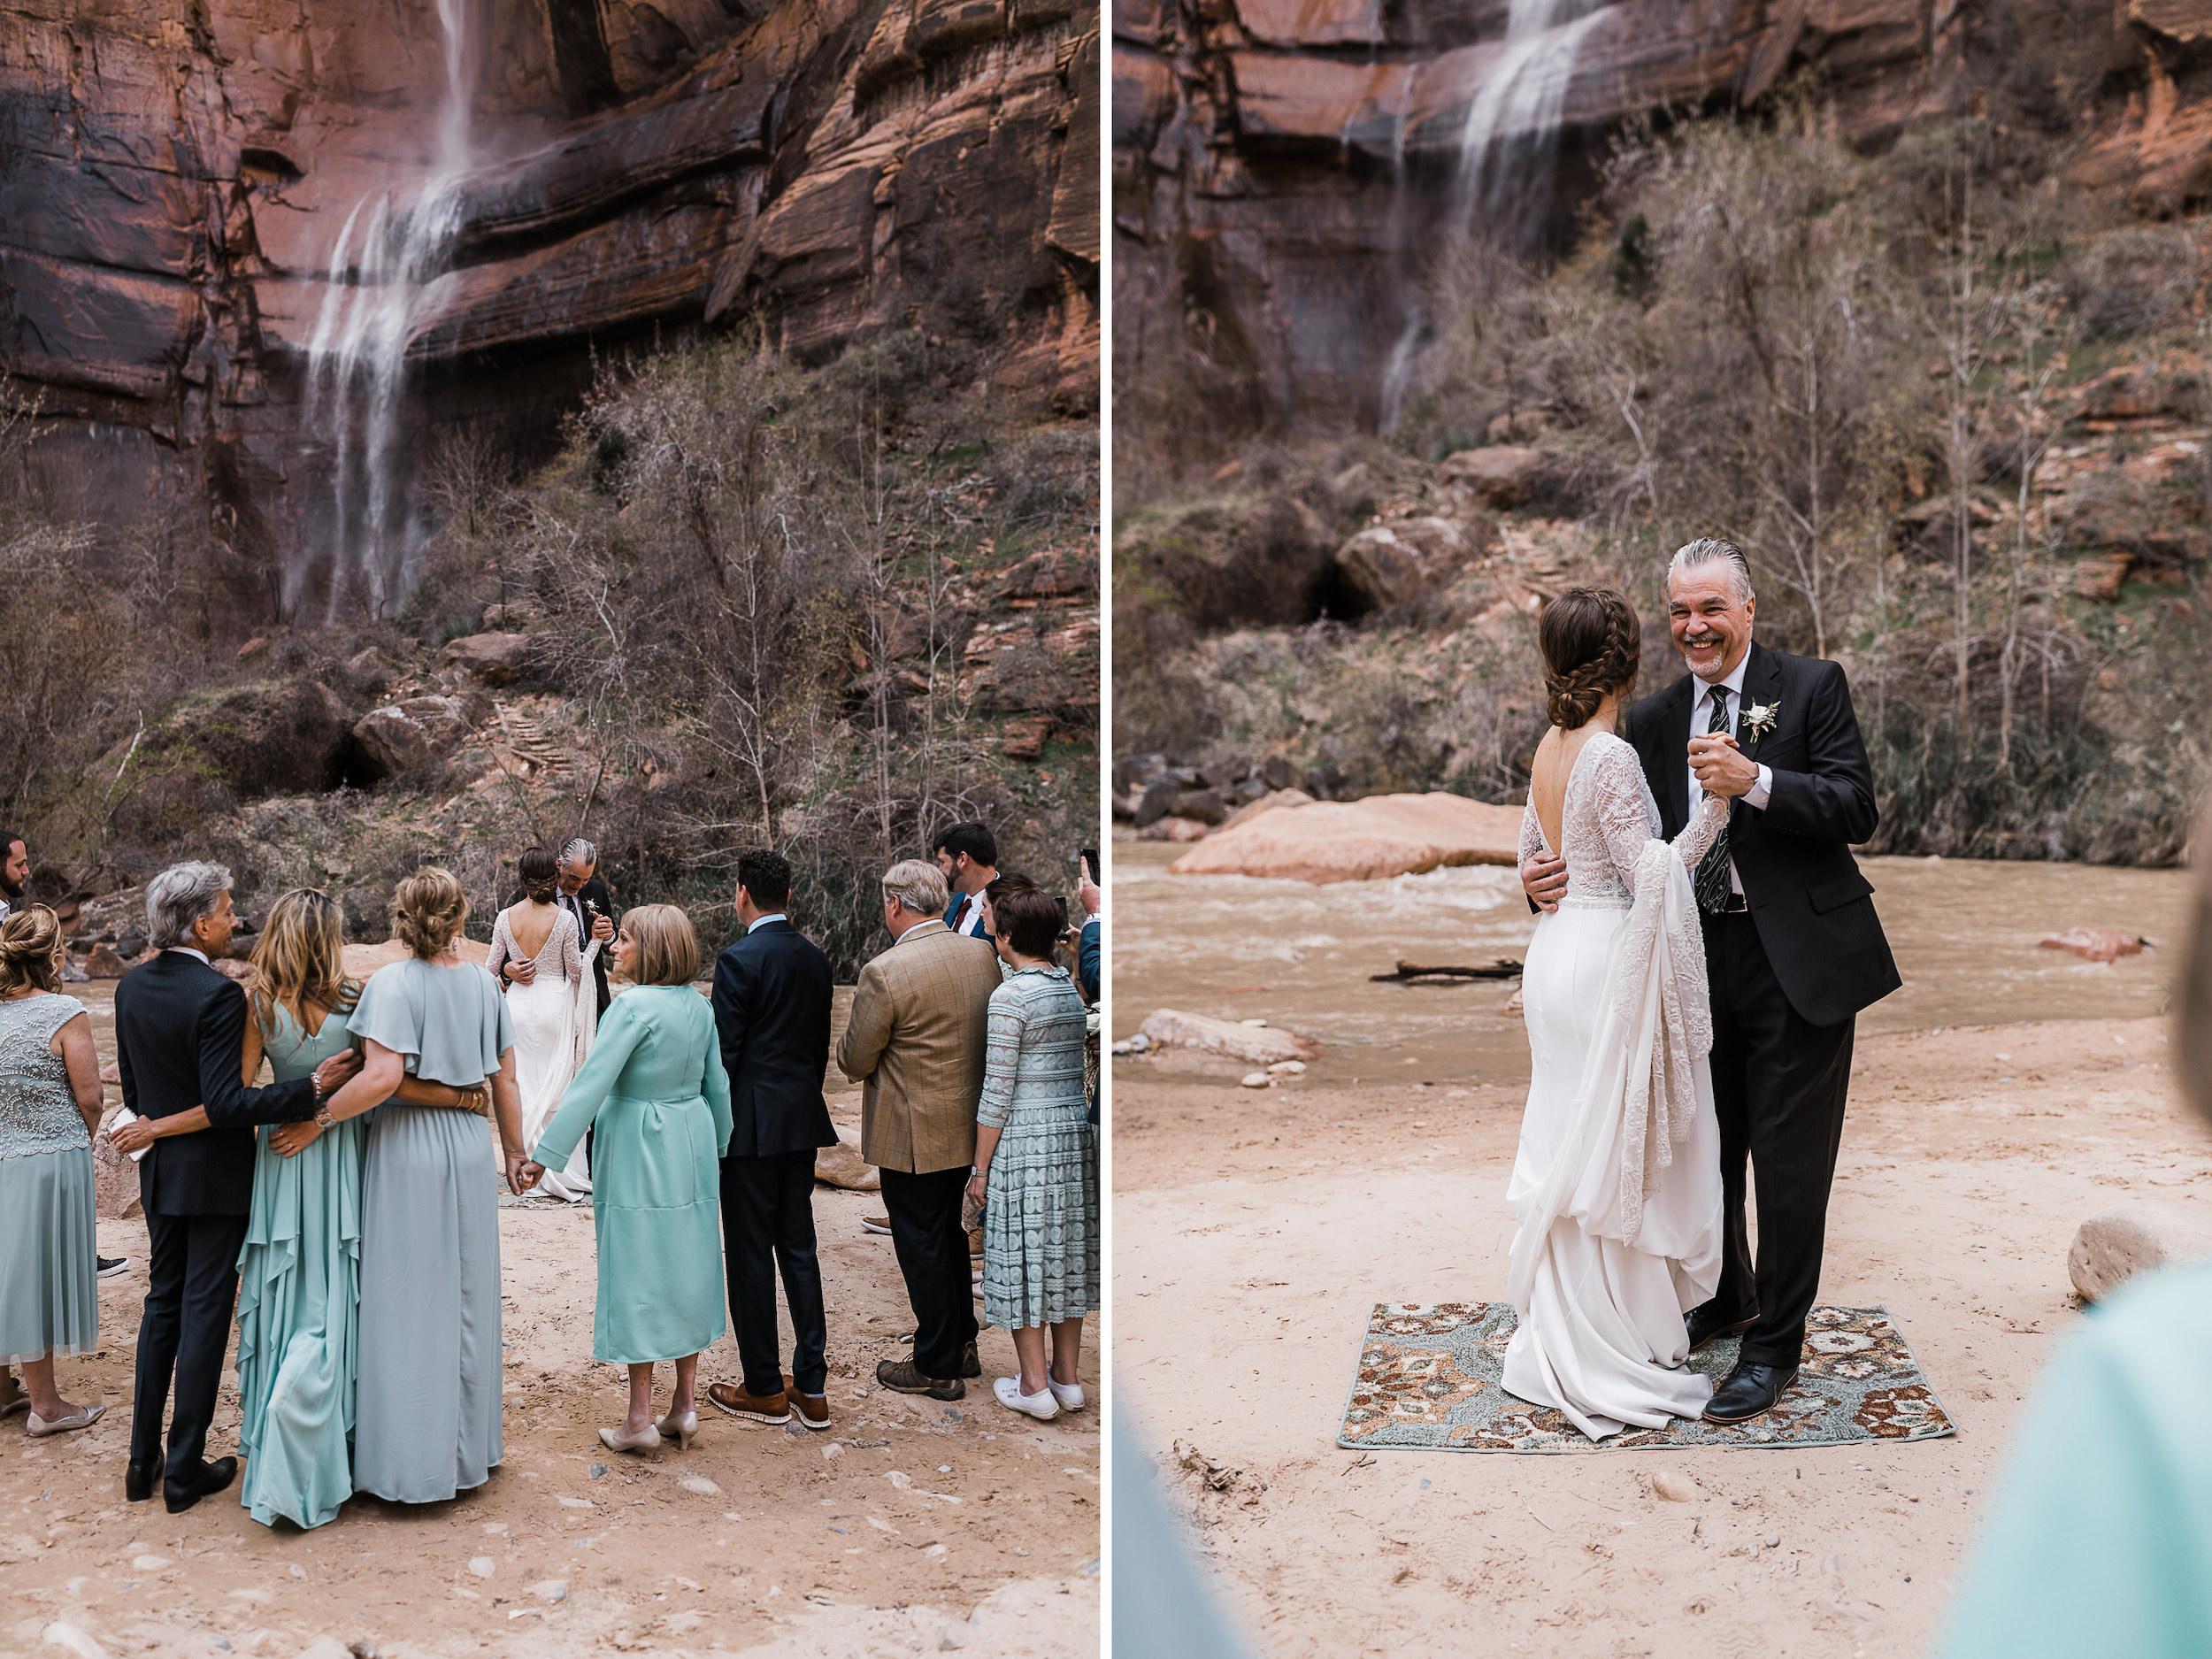 Zion-National-Park-Adventure-Wedding-Hearnes-Elopement-Photography-20.jpg